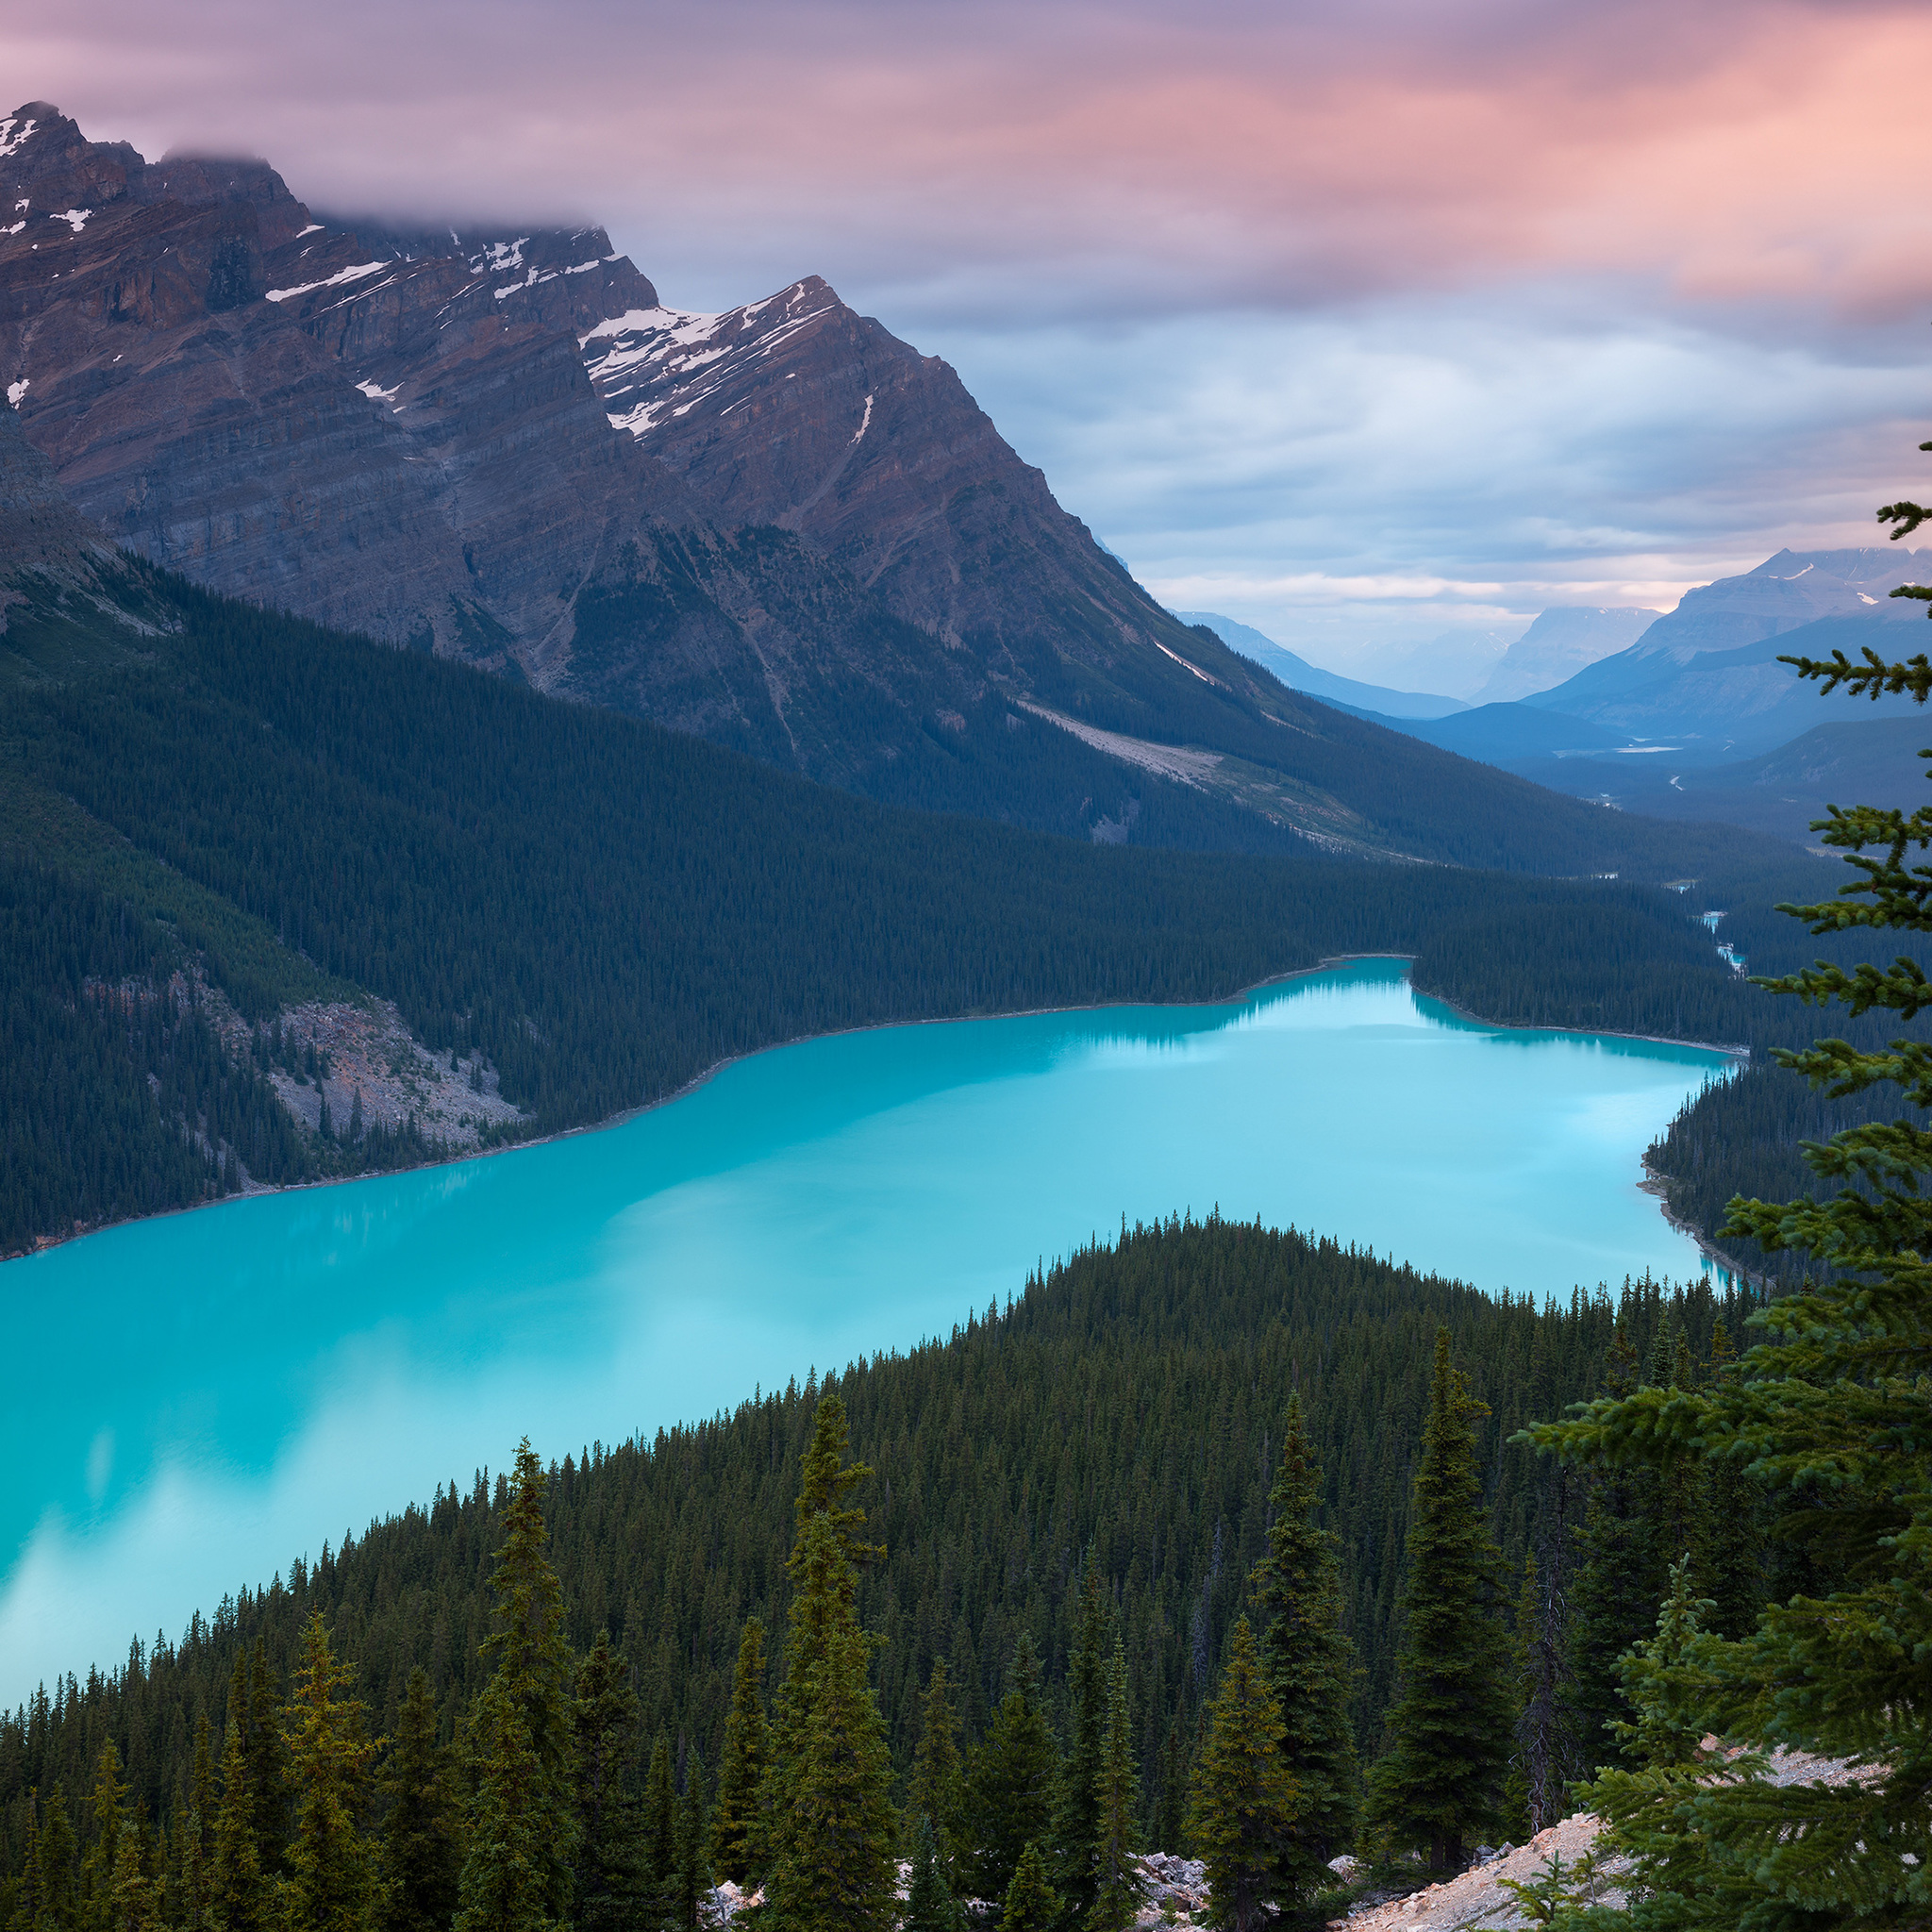 Smartphone Wallpaper 4k Nature: 2048x2048 Peyto Lake Canada Mountains 4k Ipad Air HD 4k